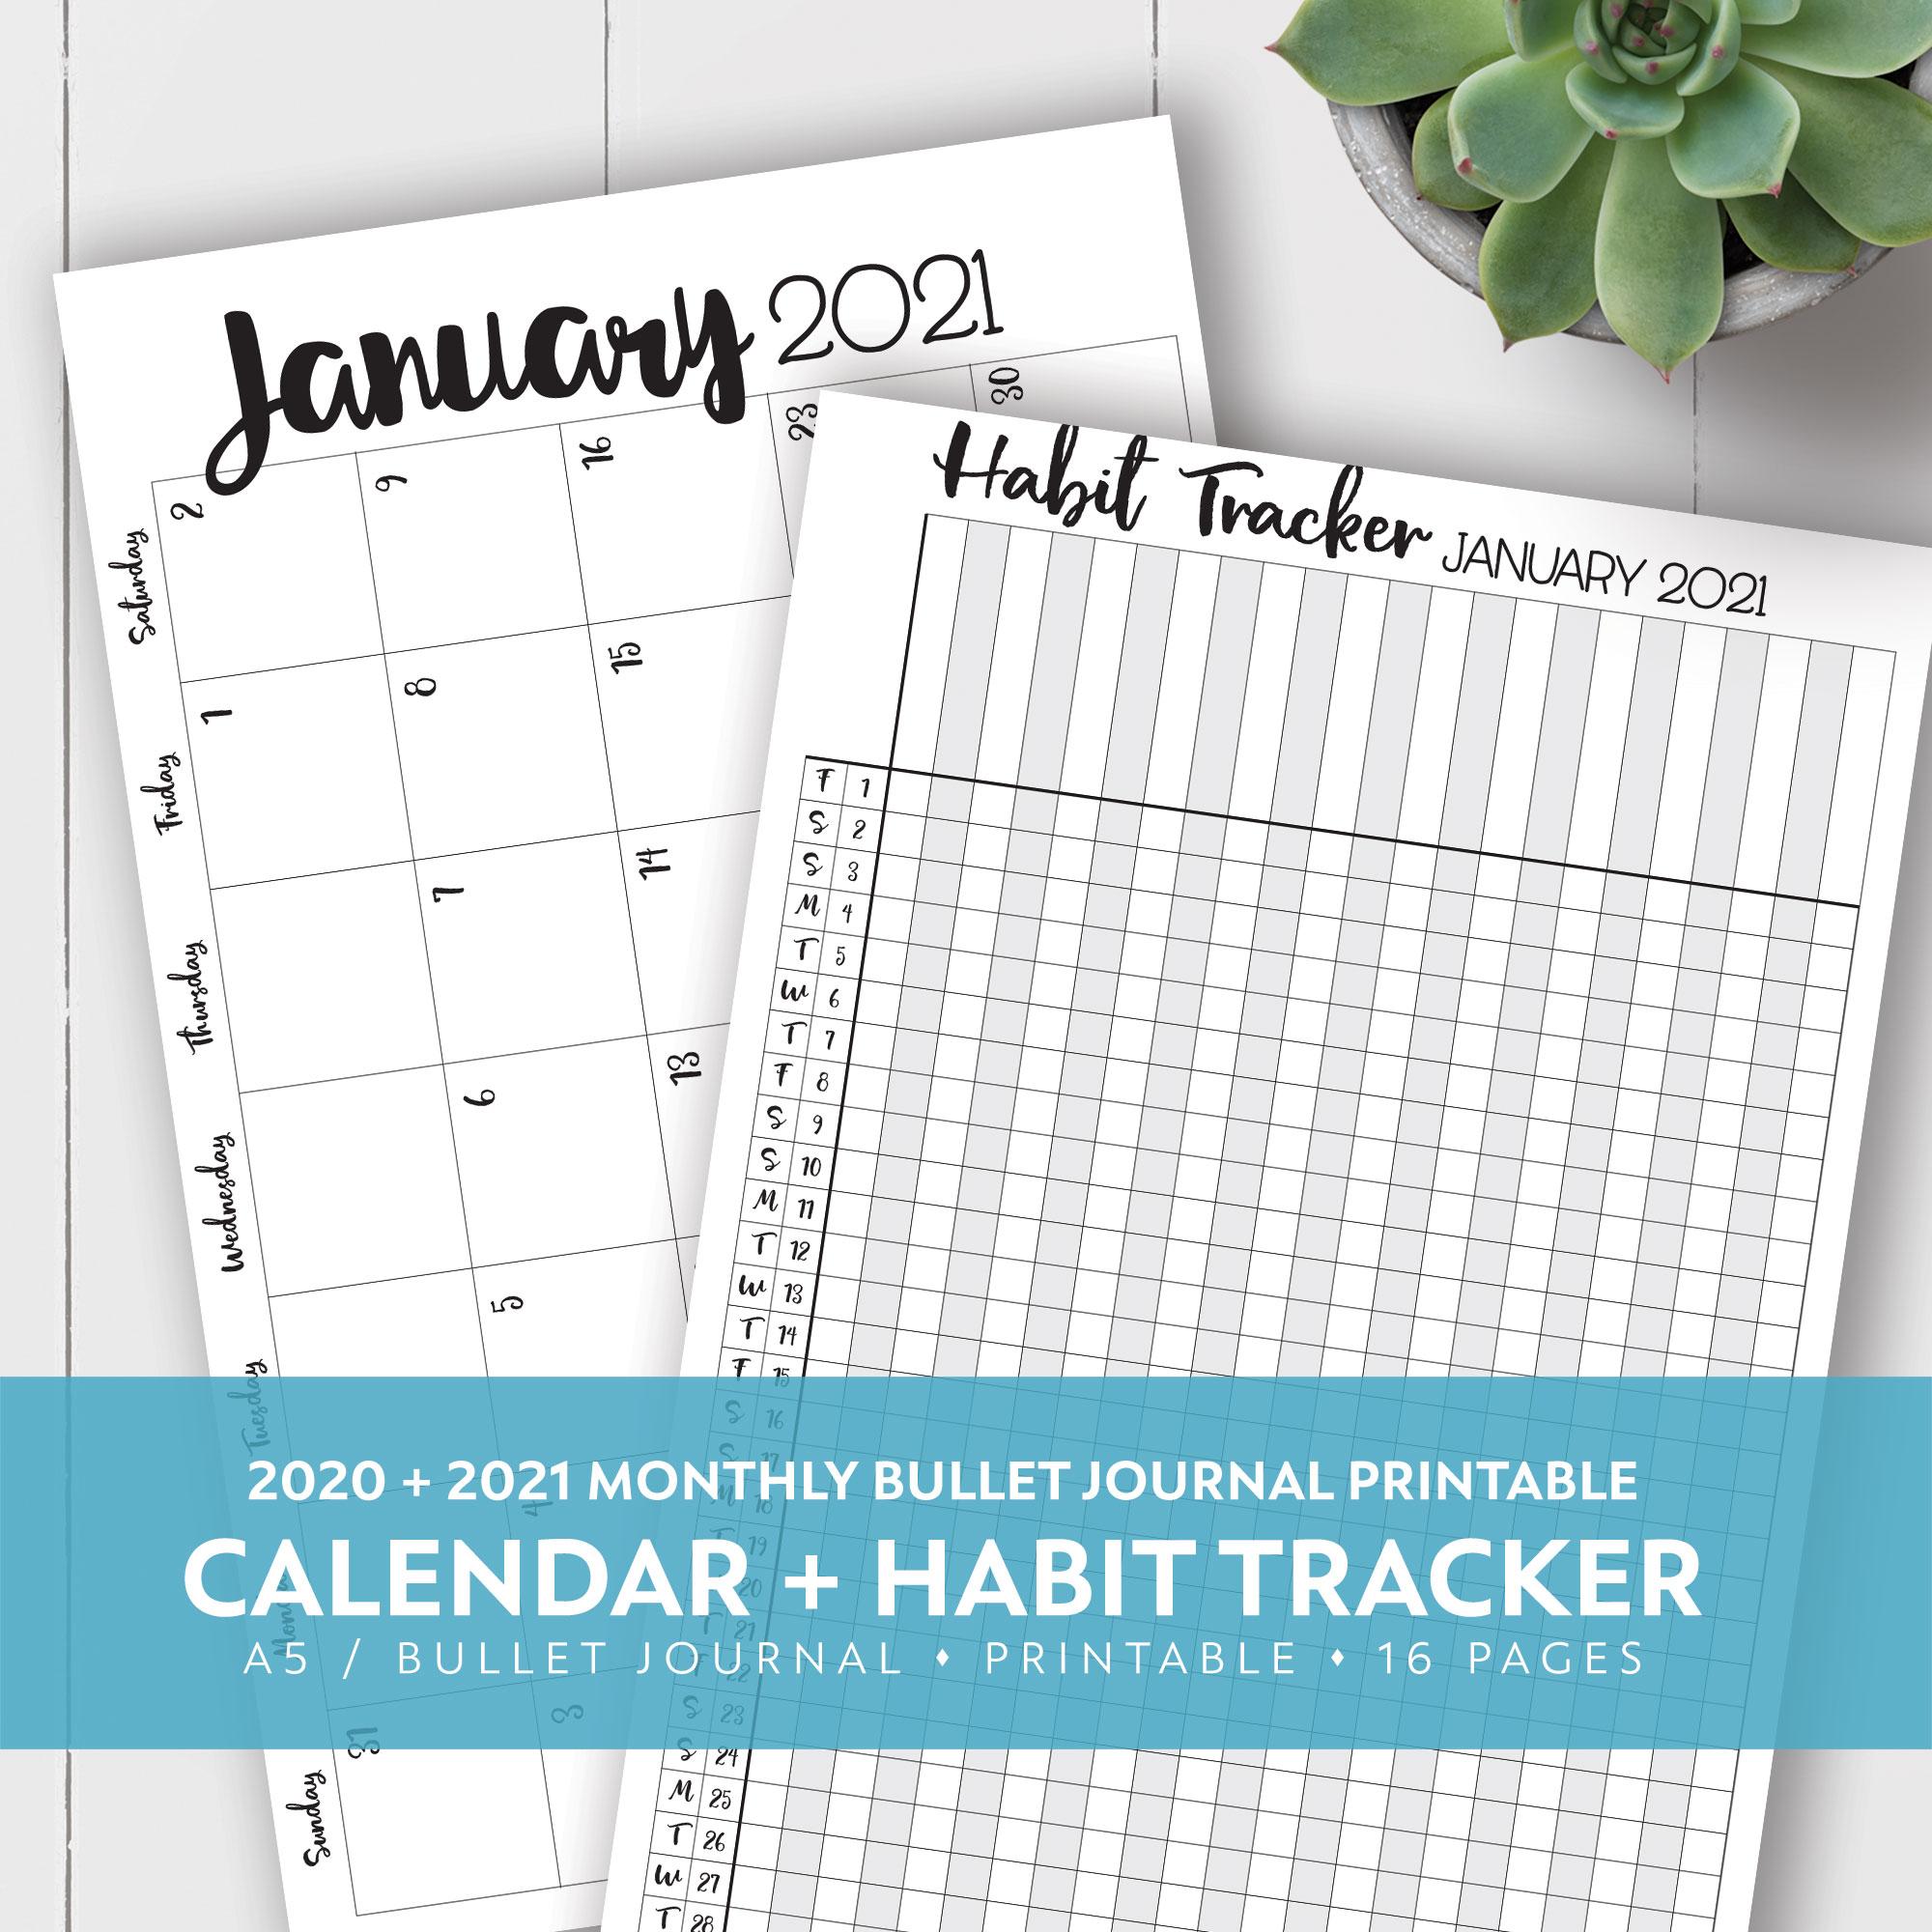 2020 + 2021 Monthly Printable Calendar + Habit Tracker Kit inside Hunting Planner 2021 Monthly